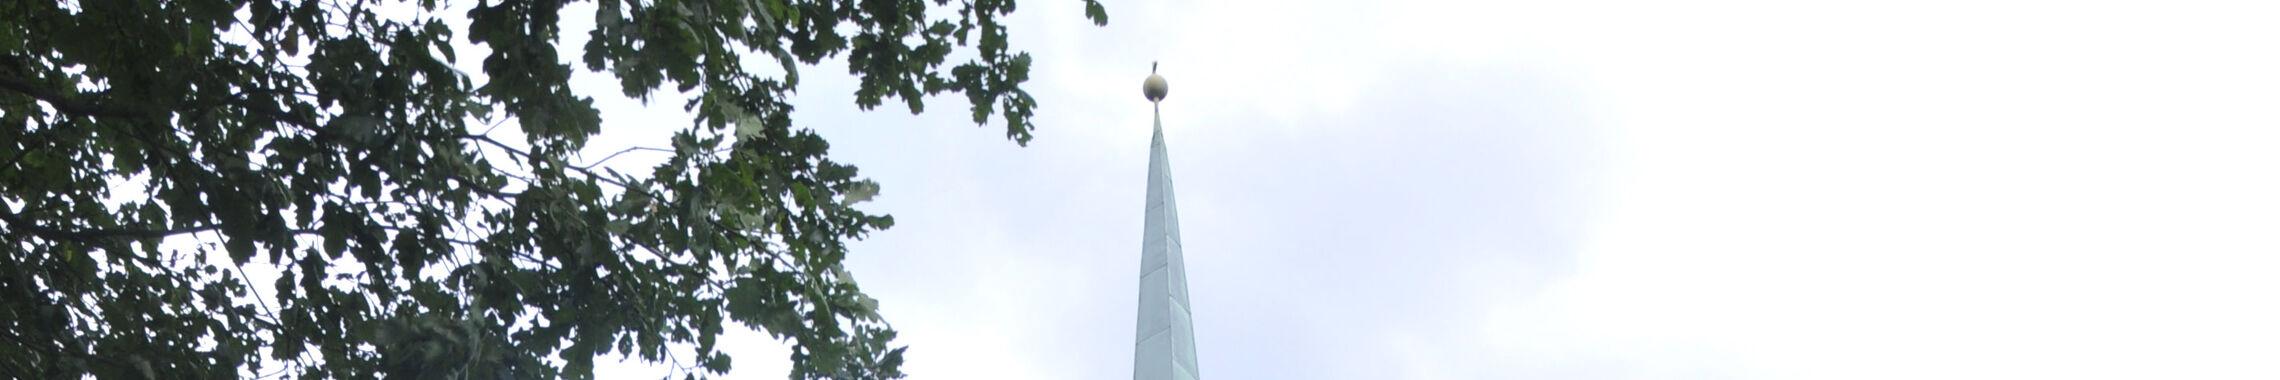 barendorf kirchturm kopfbild